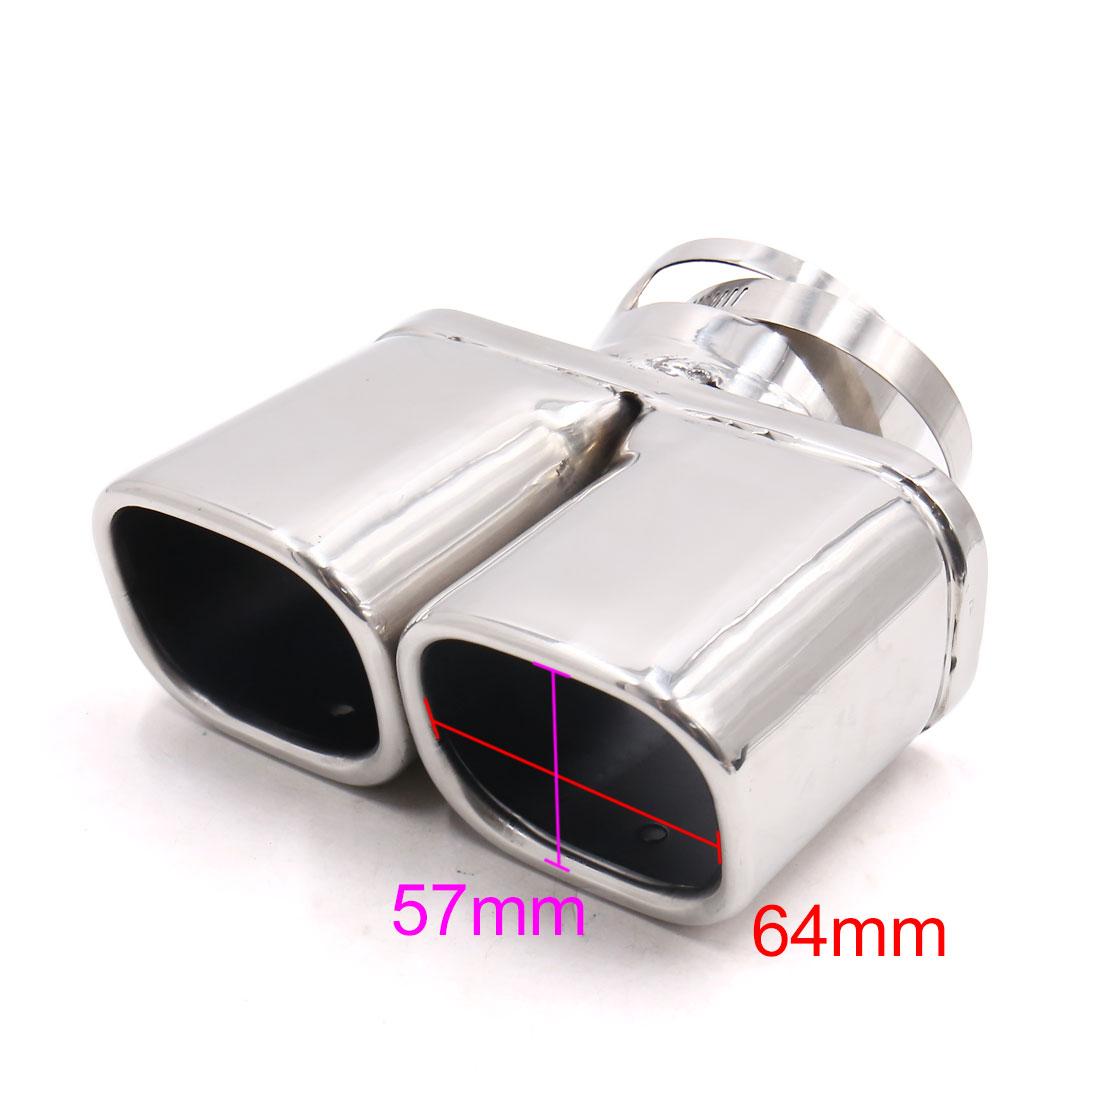 71mm Inlet Inner Diameter Silver Tone Stainless Steel Car Exhaust Pipe Muffler - image 1 de 4